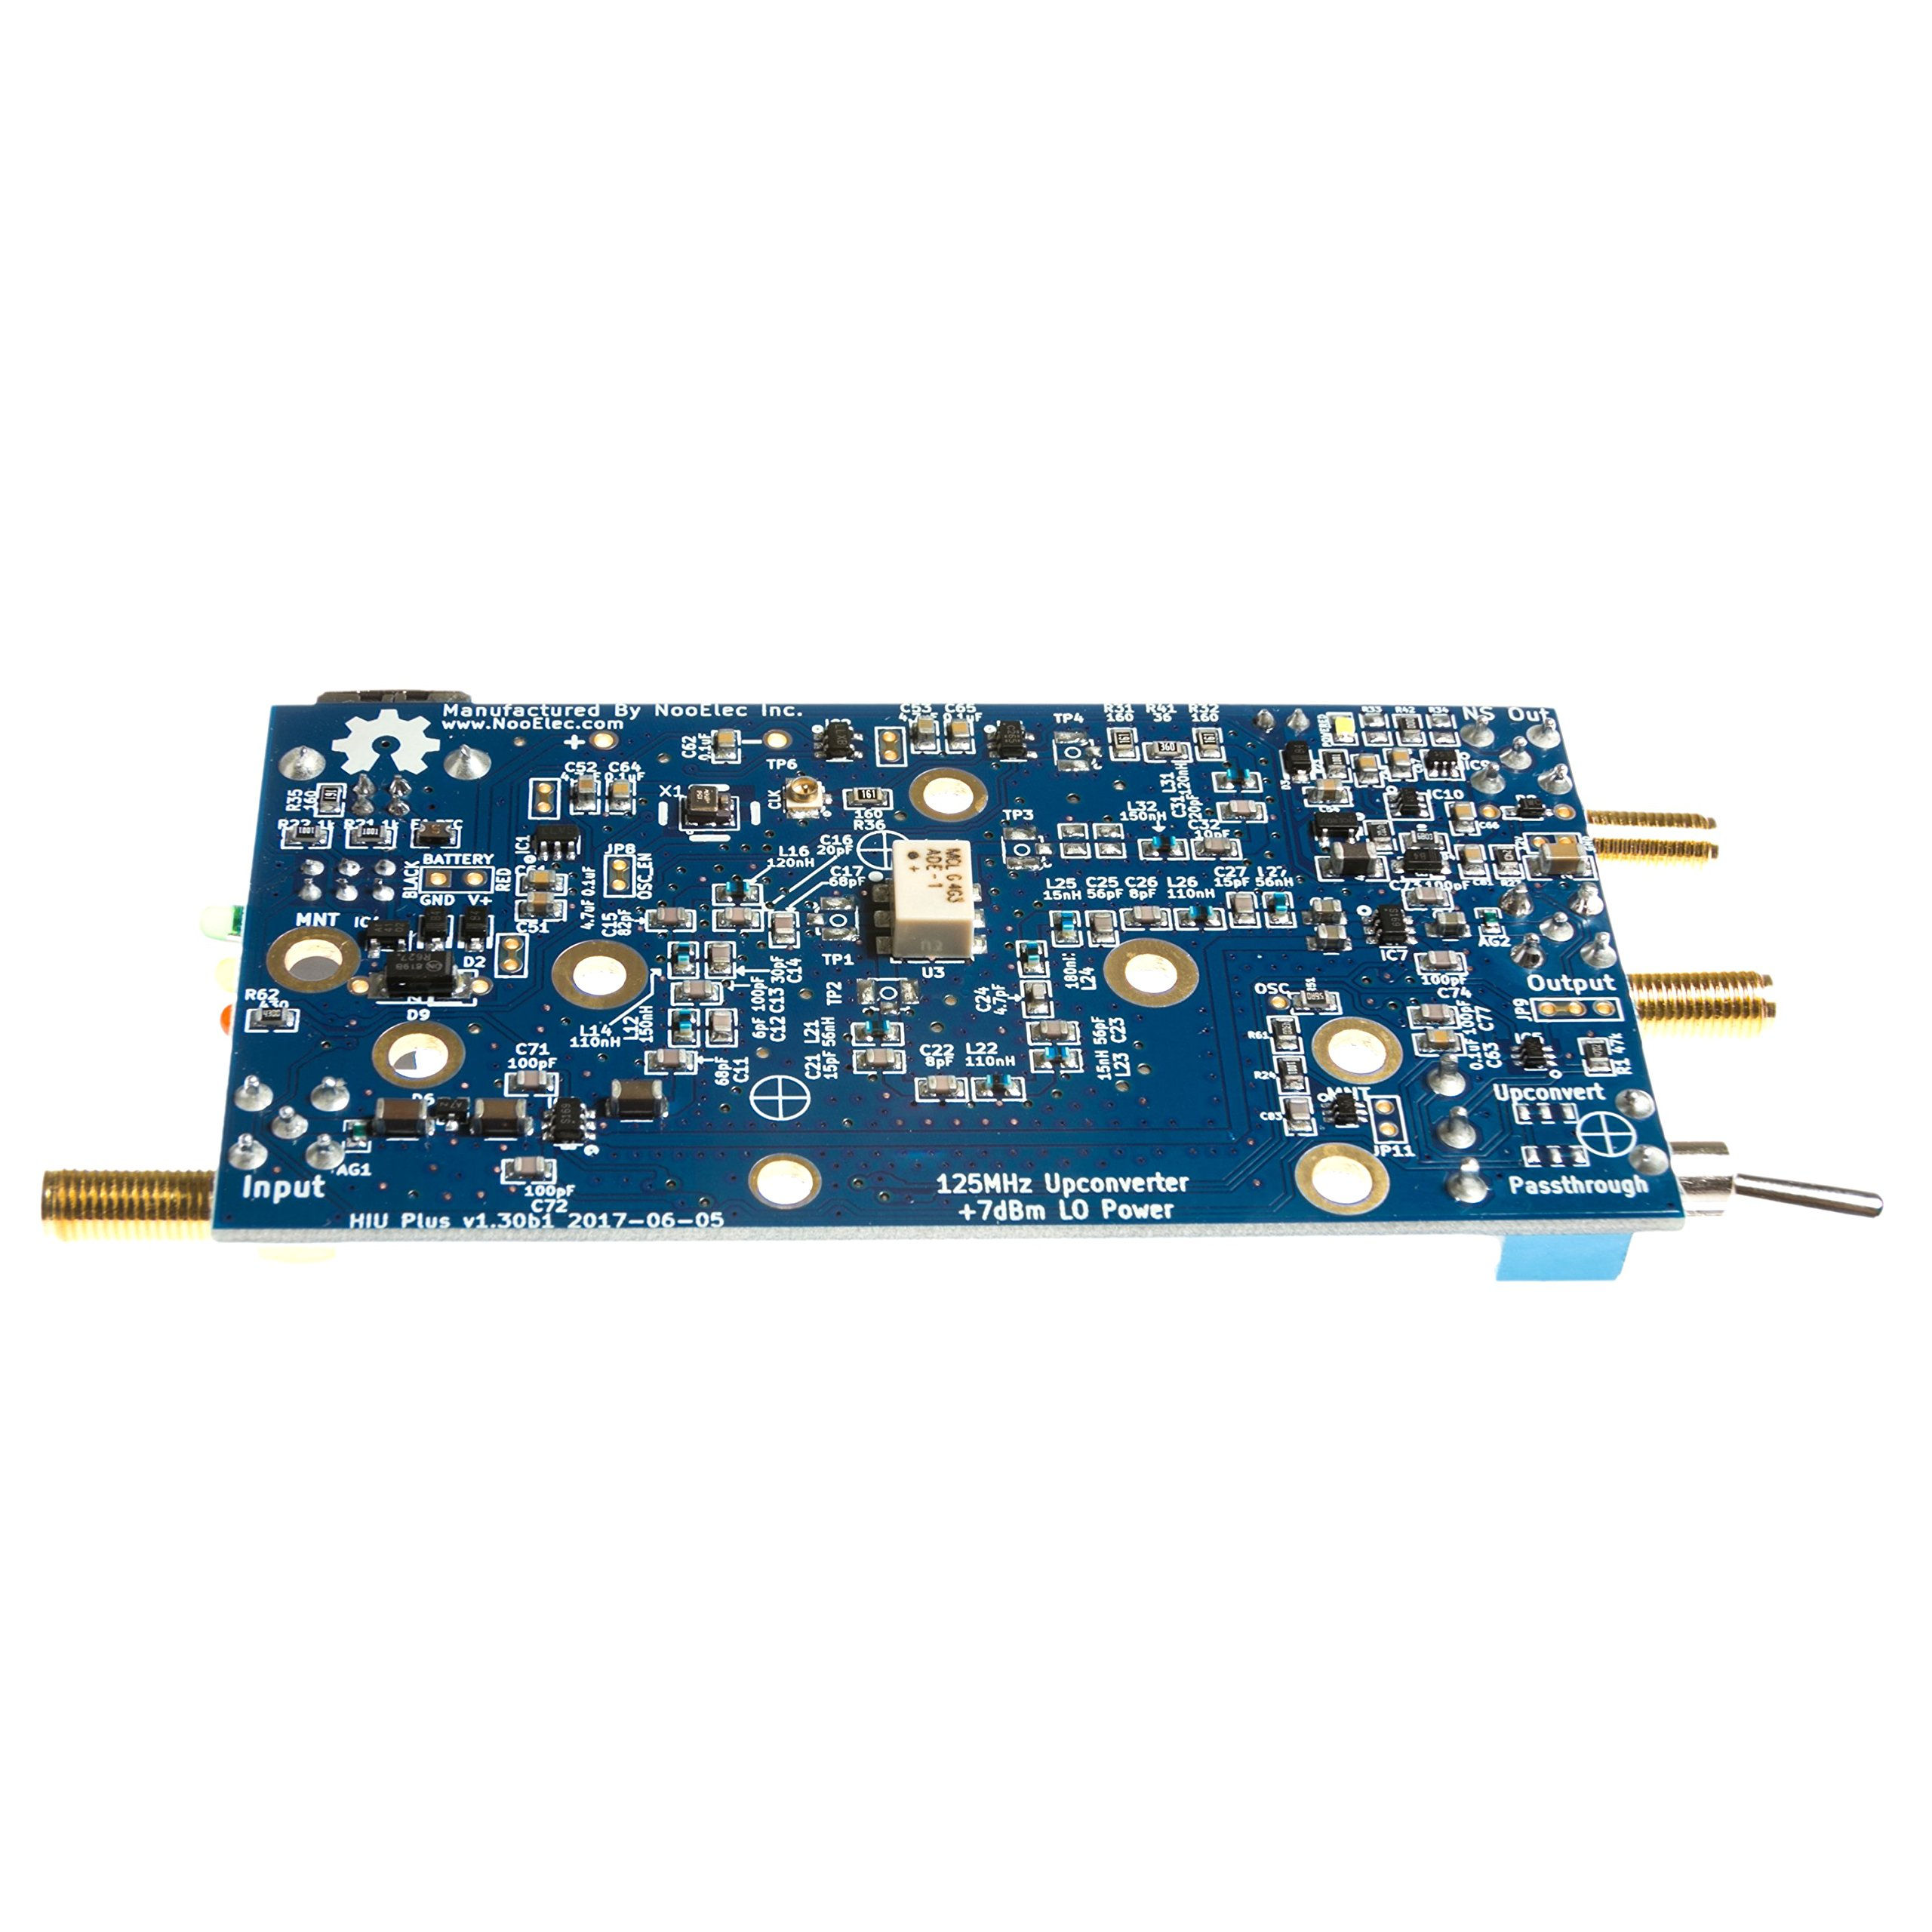 Ham It Up Plus - HF/MF/LF/VLF/ULF Upconverter w/TCXO & Separate